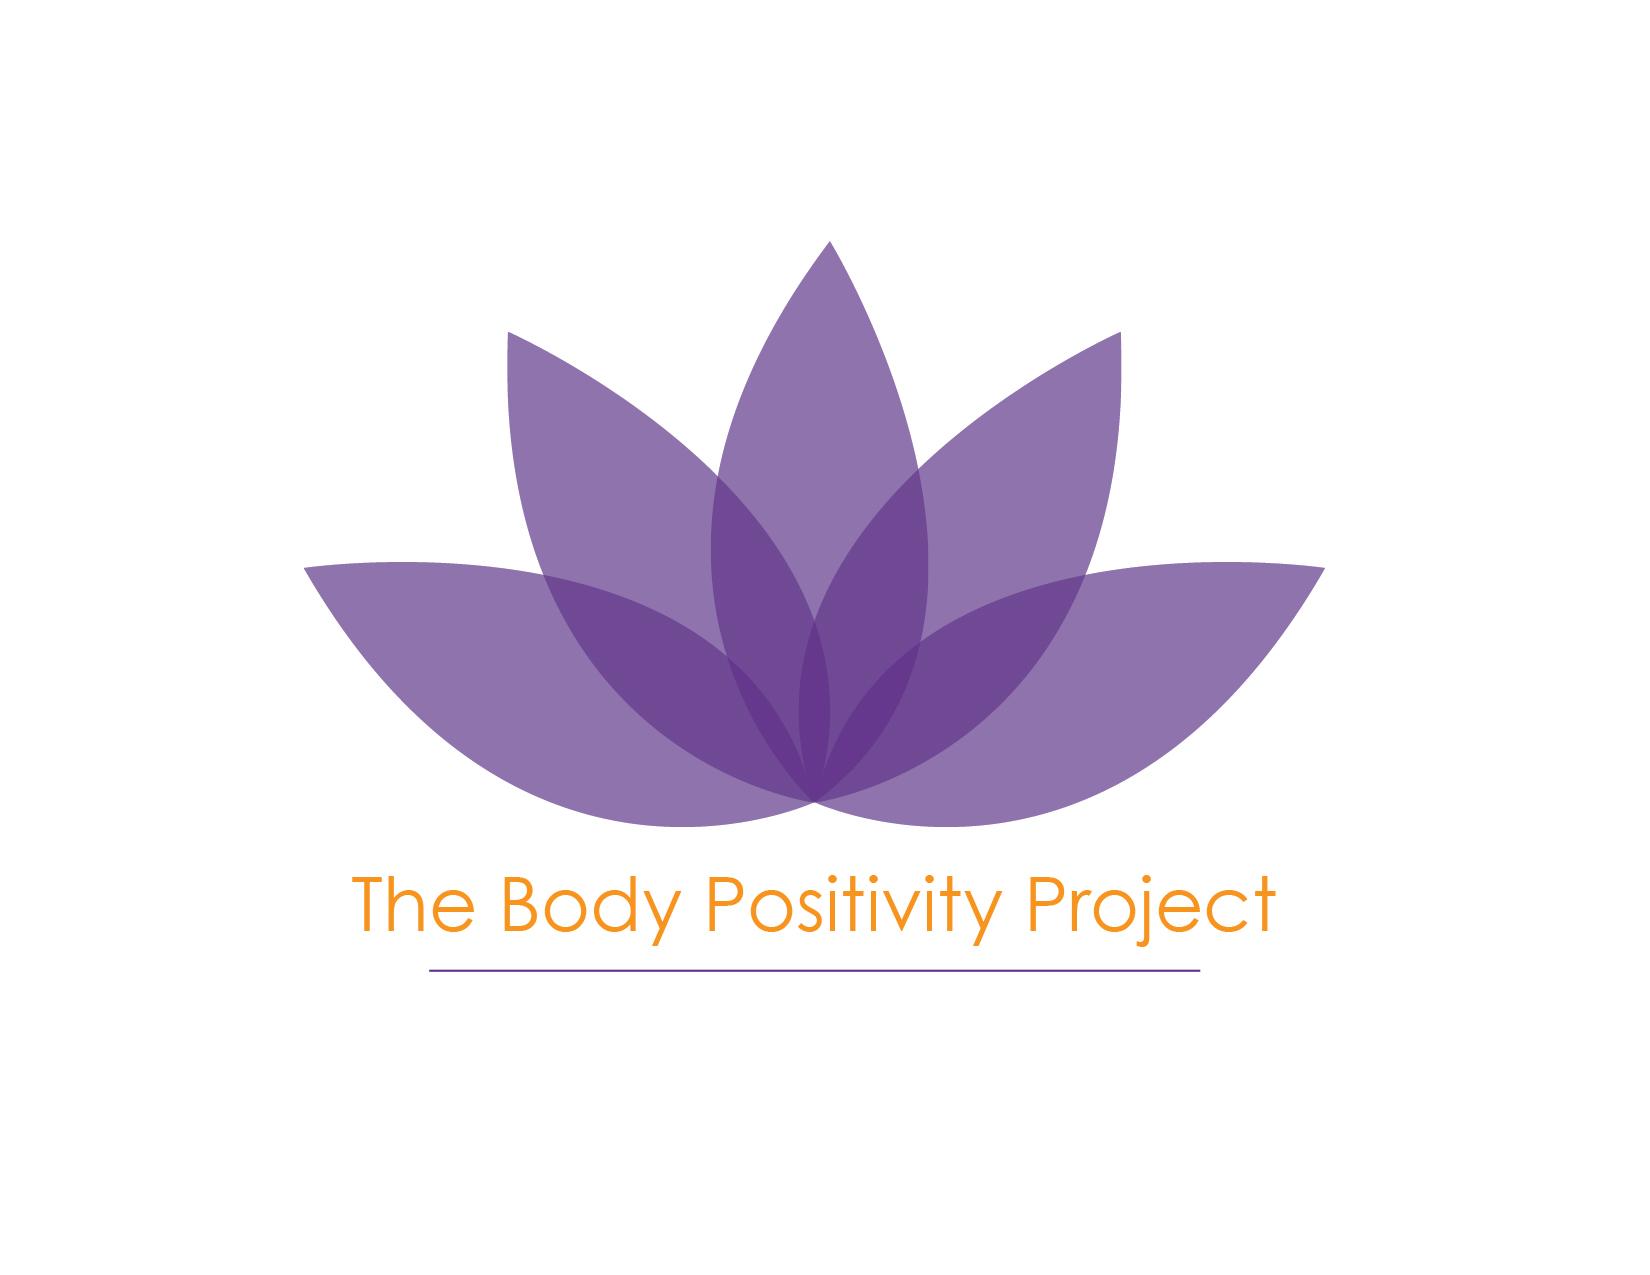 The Body Positivity Project Logo